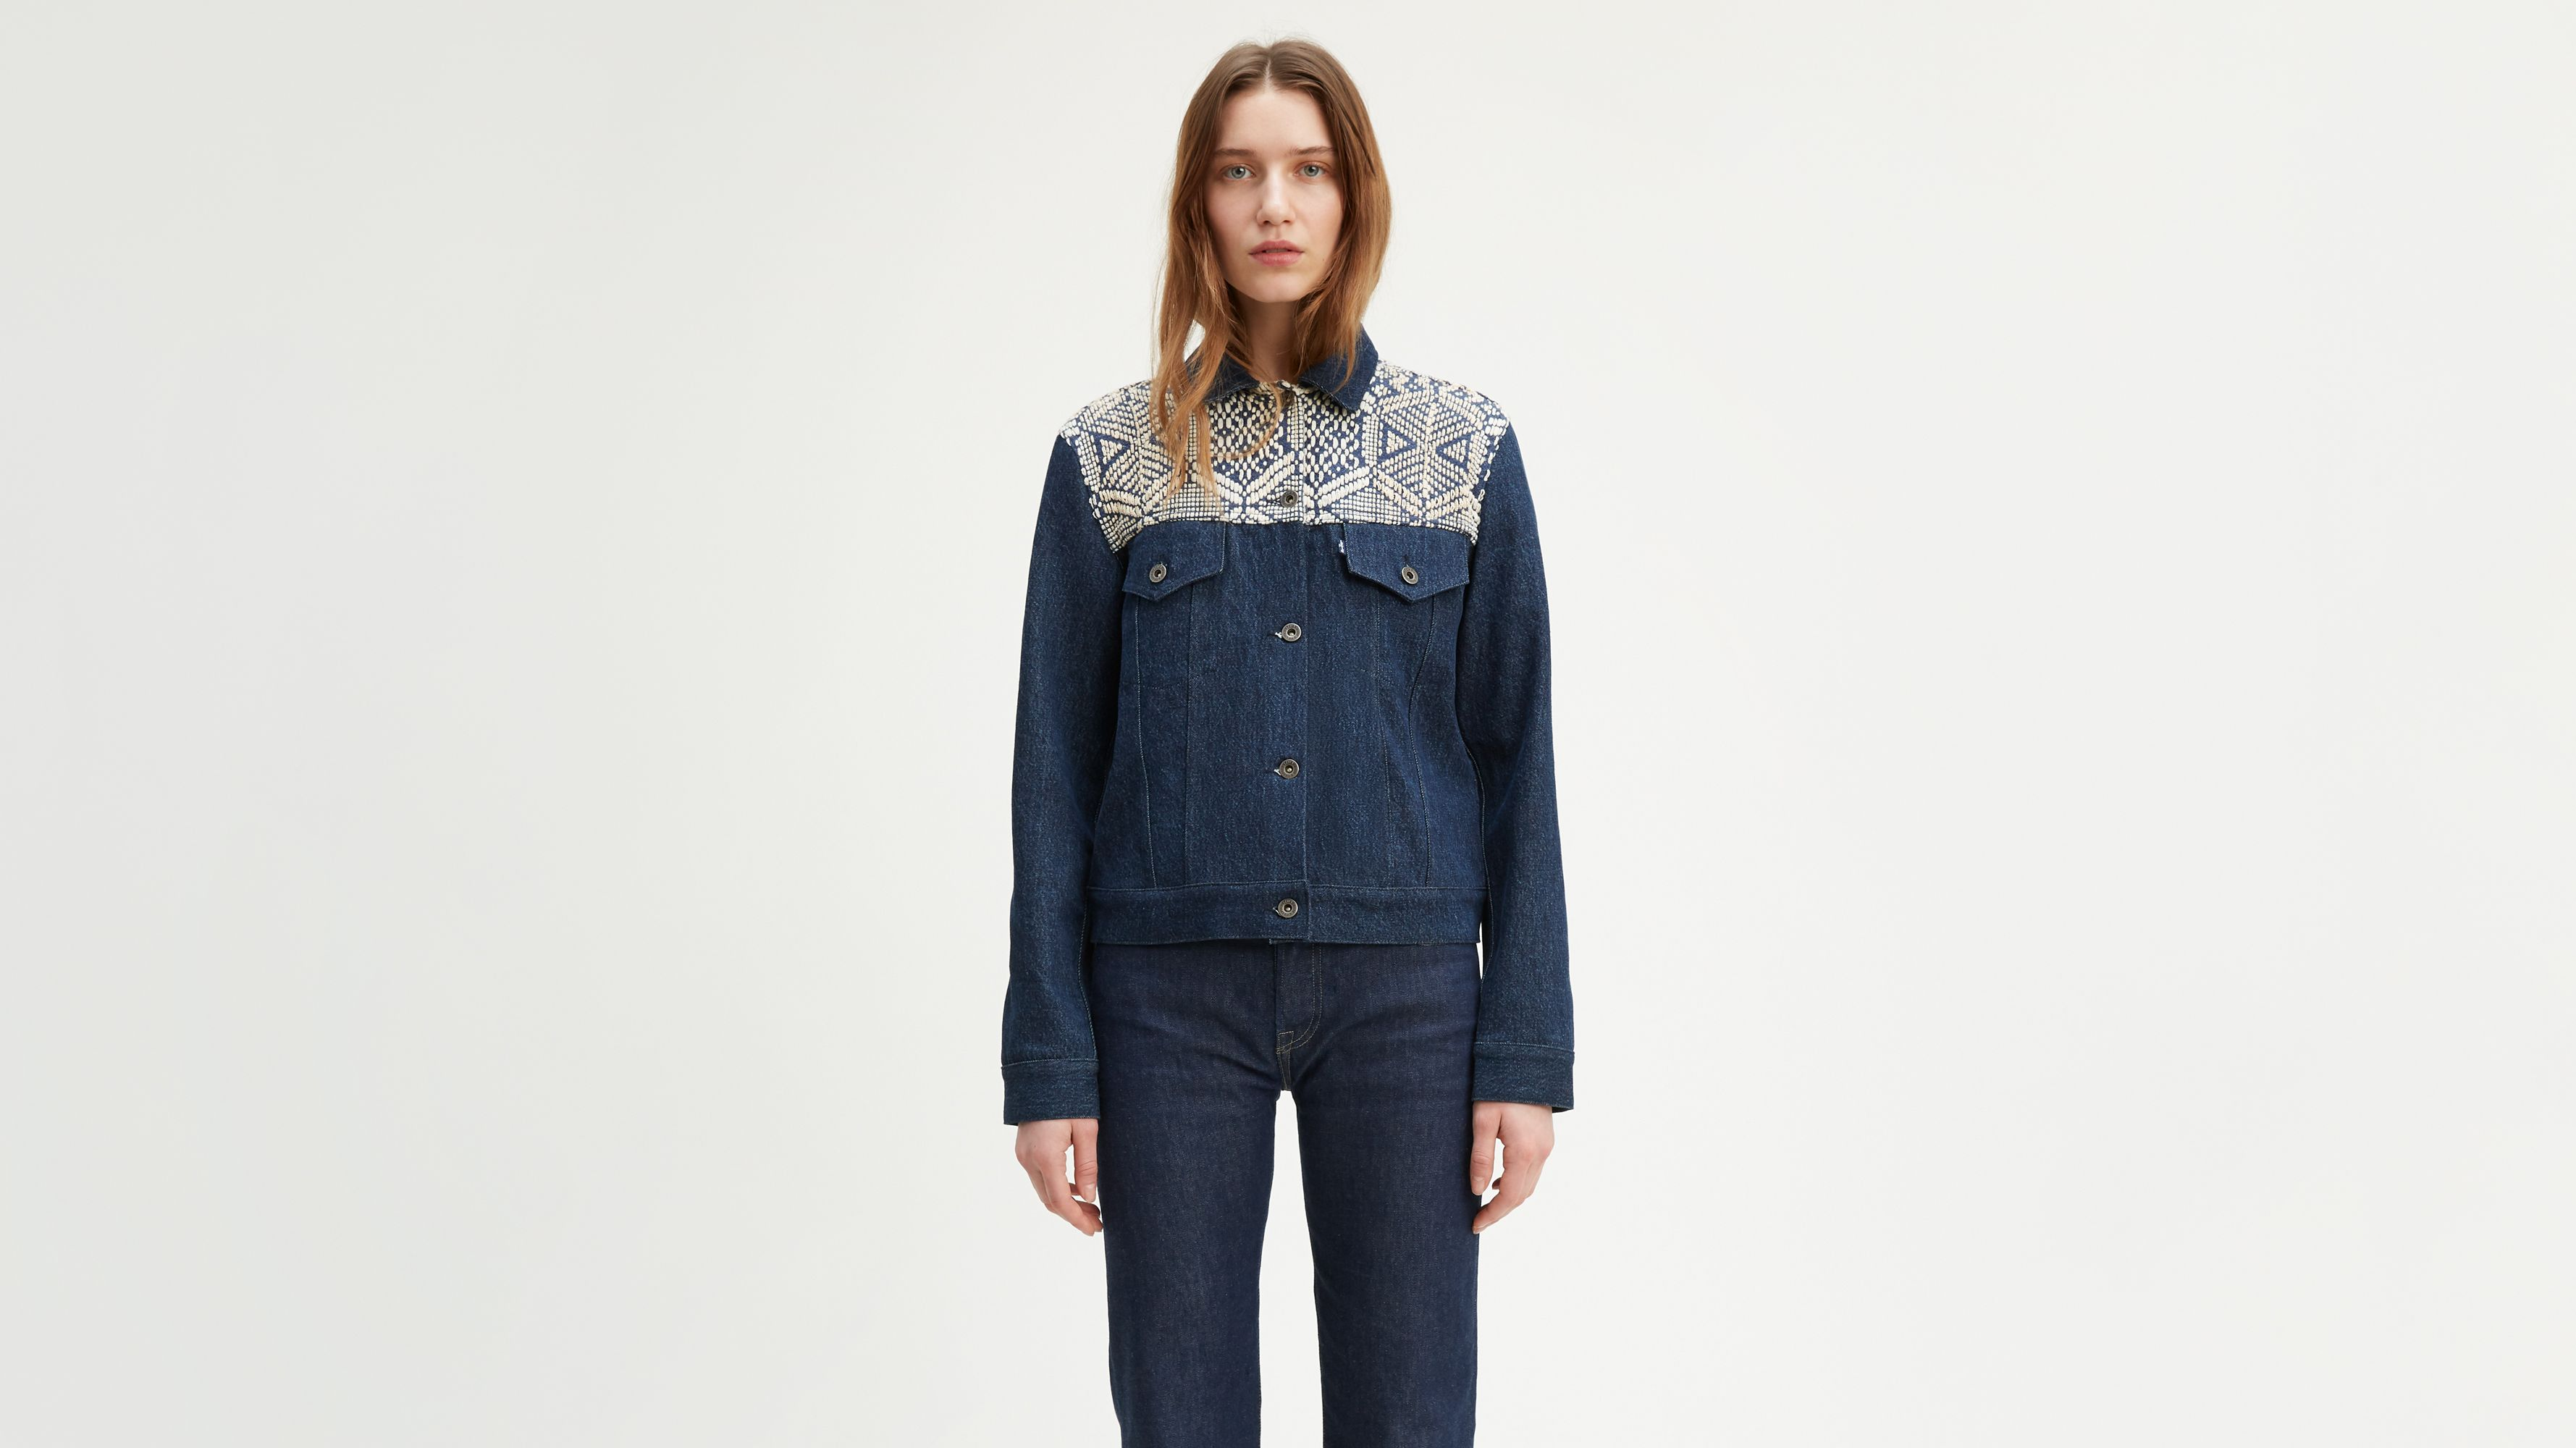 Donna Giacche Di Jeans & Sherpas | Levi's® IT